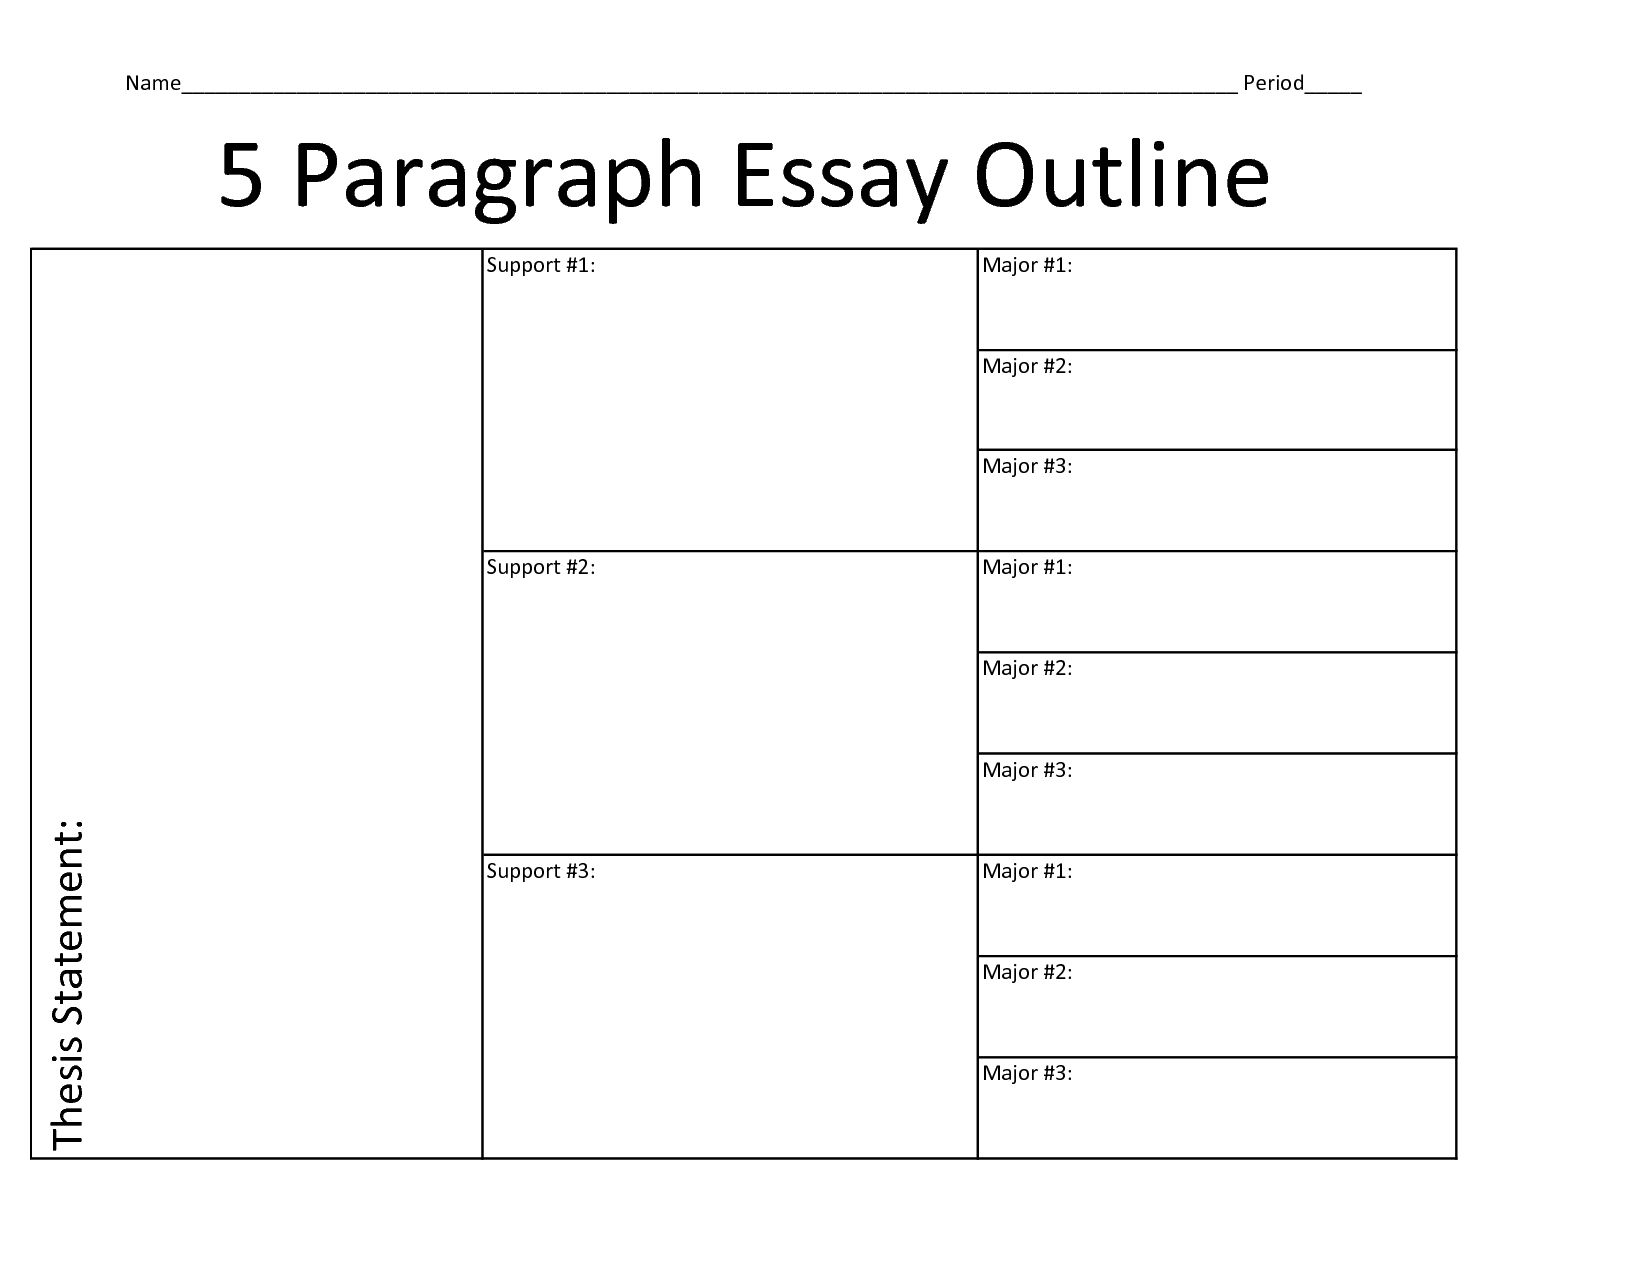 Buy a narrative essay outline template